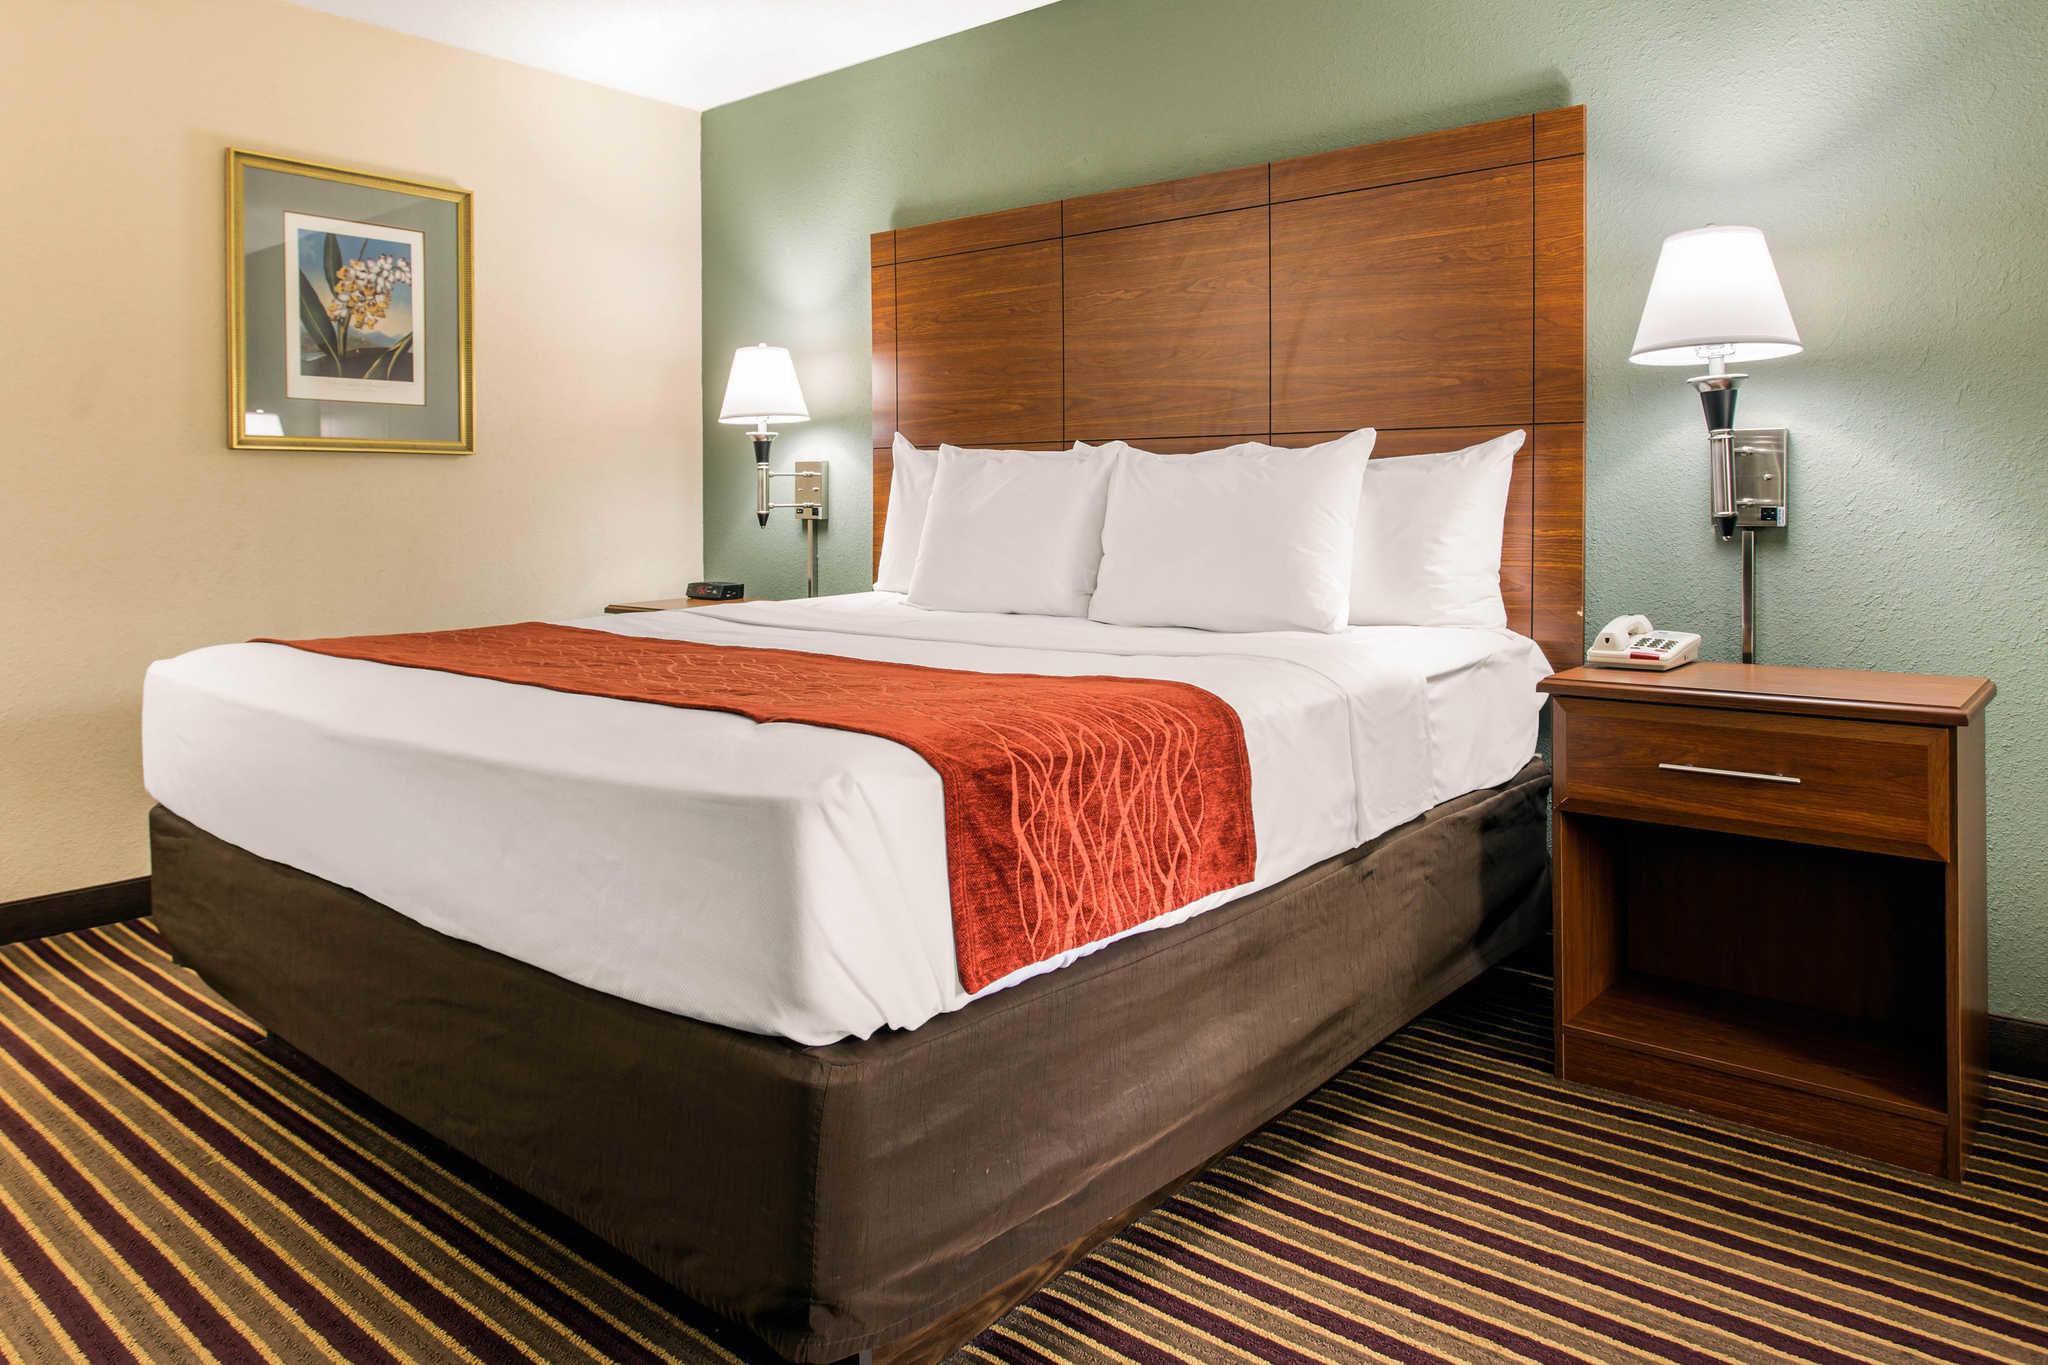 Comfort Inn & Suites Crabtree Valley image 16